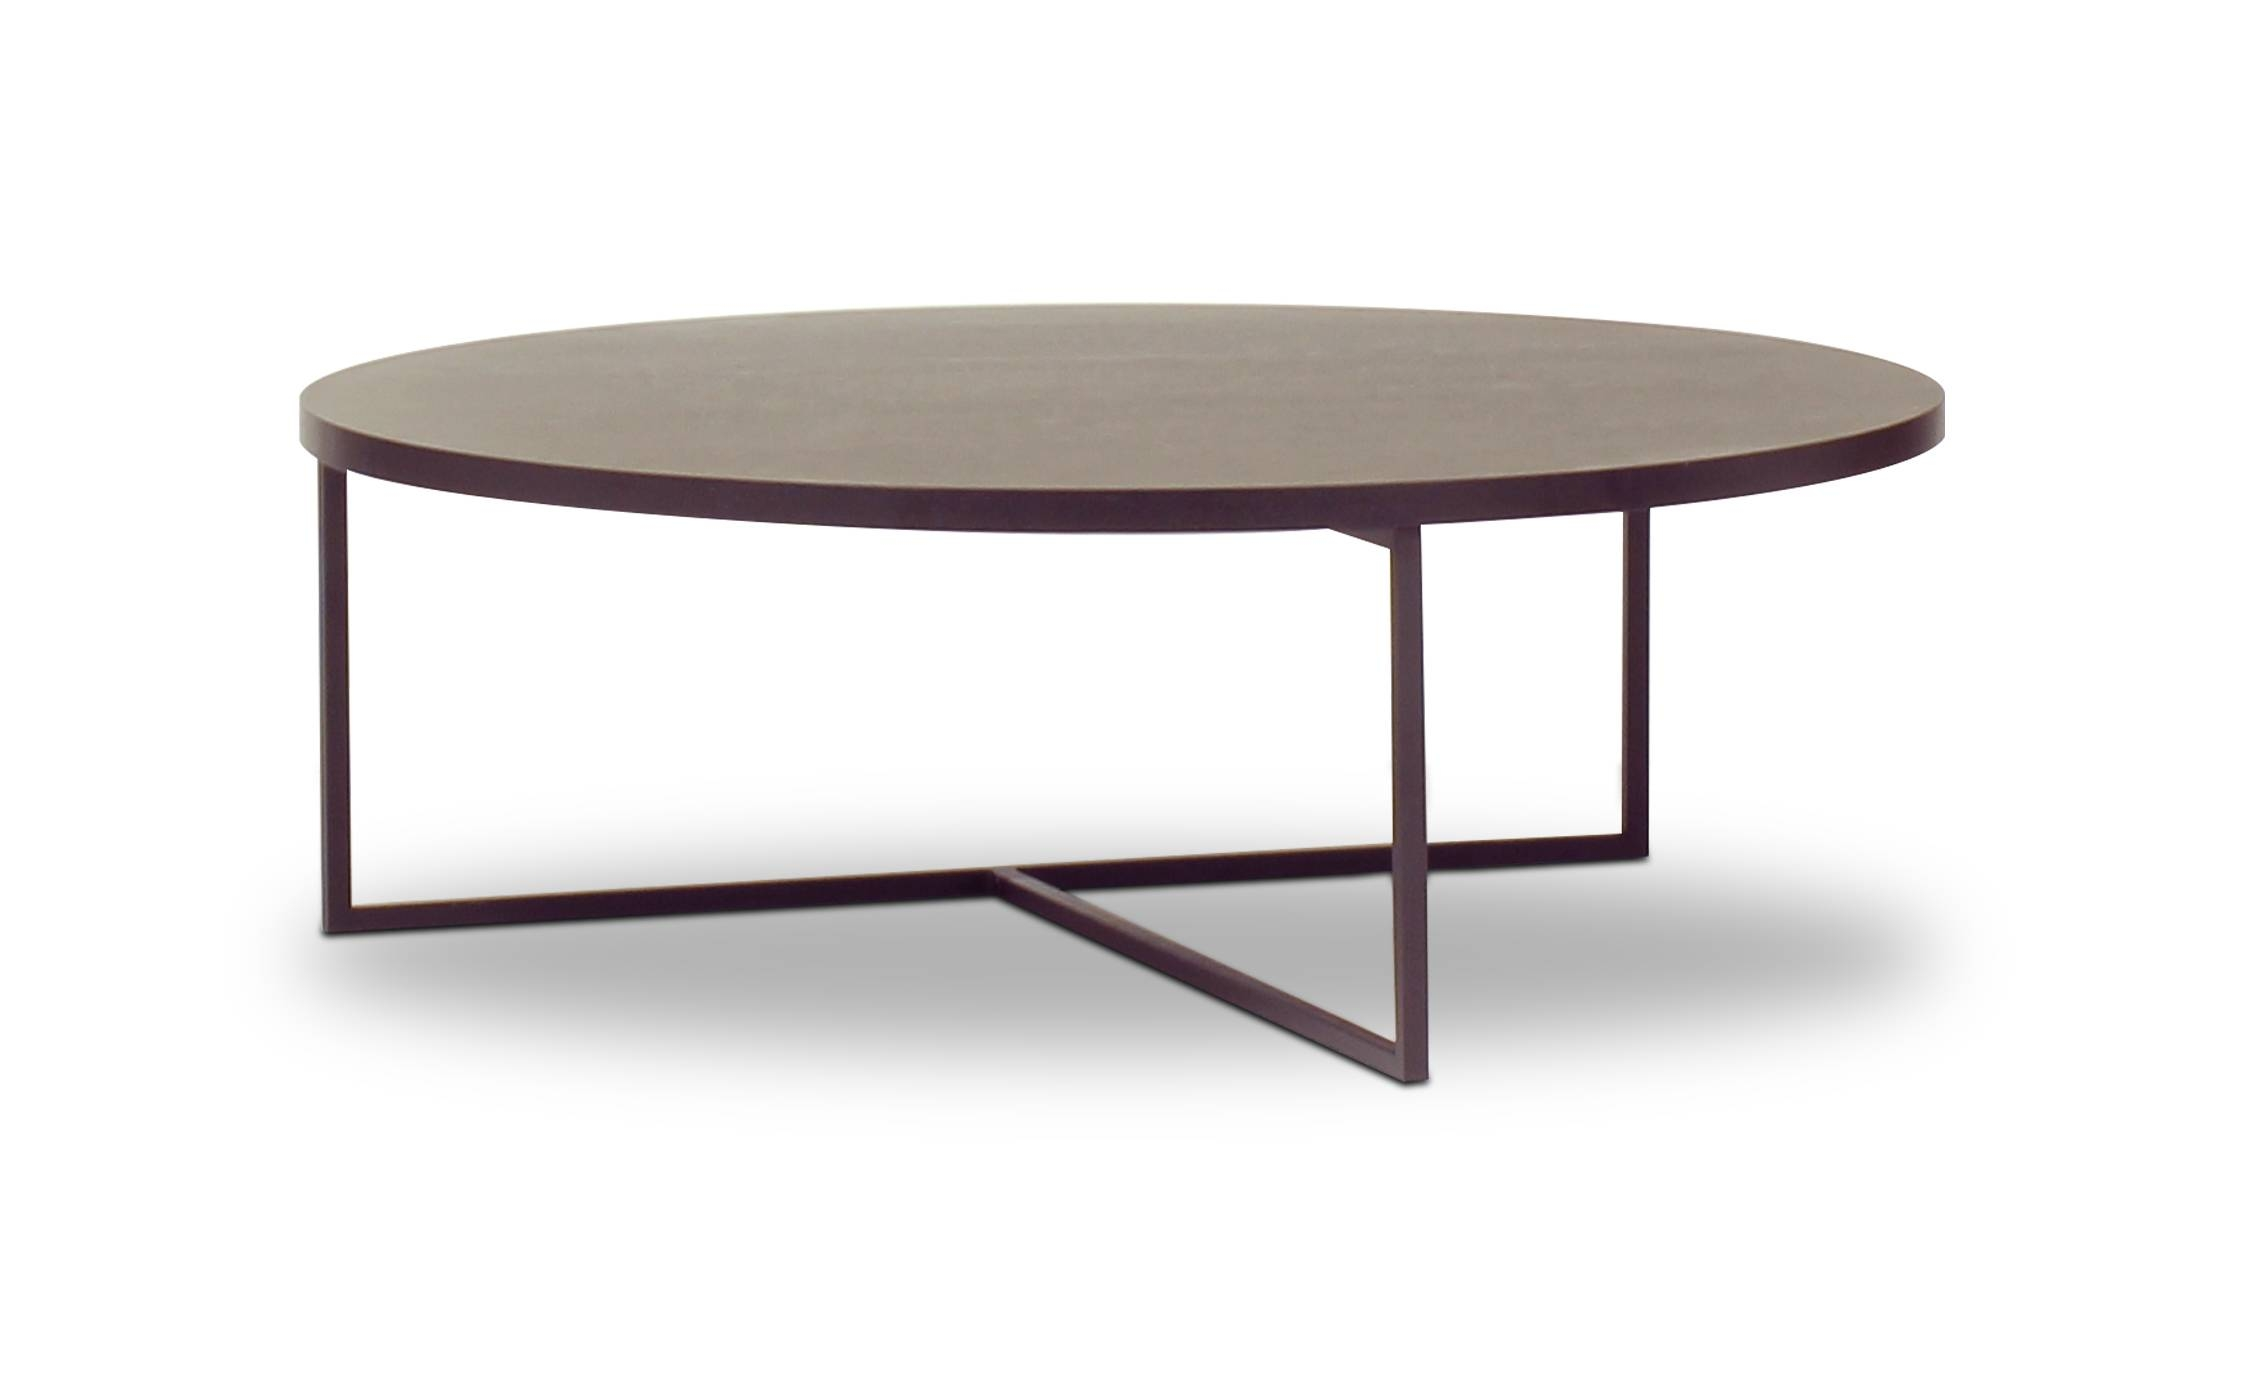 Coffee Table: Enchanting Black Round Coffee Table Designs Round with Black Circle Coffee Tables (Image 16 of 30)